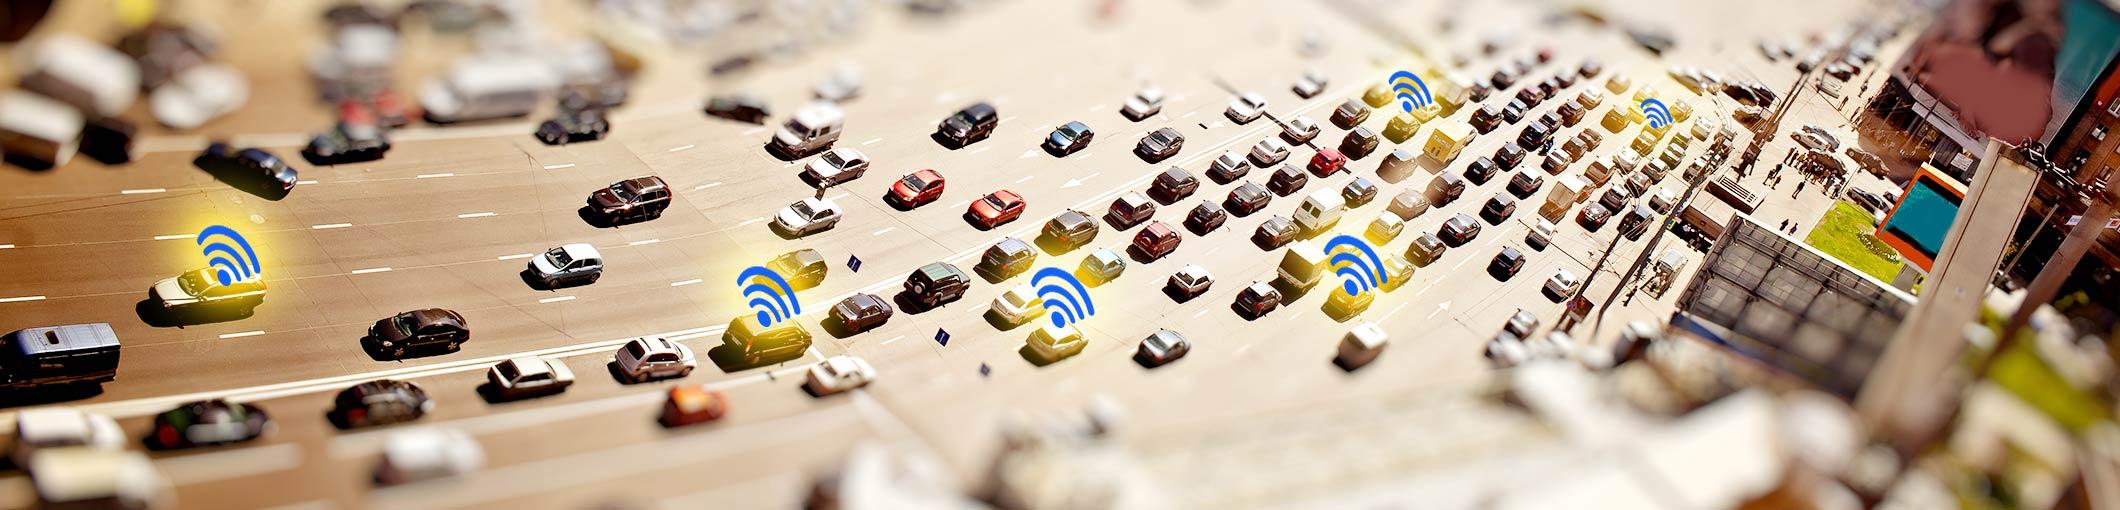 Automotive Fleet Cybersecurity